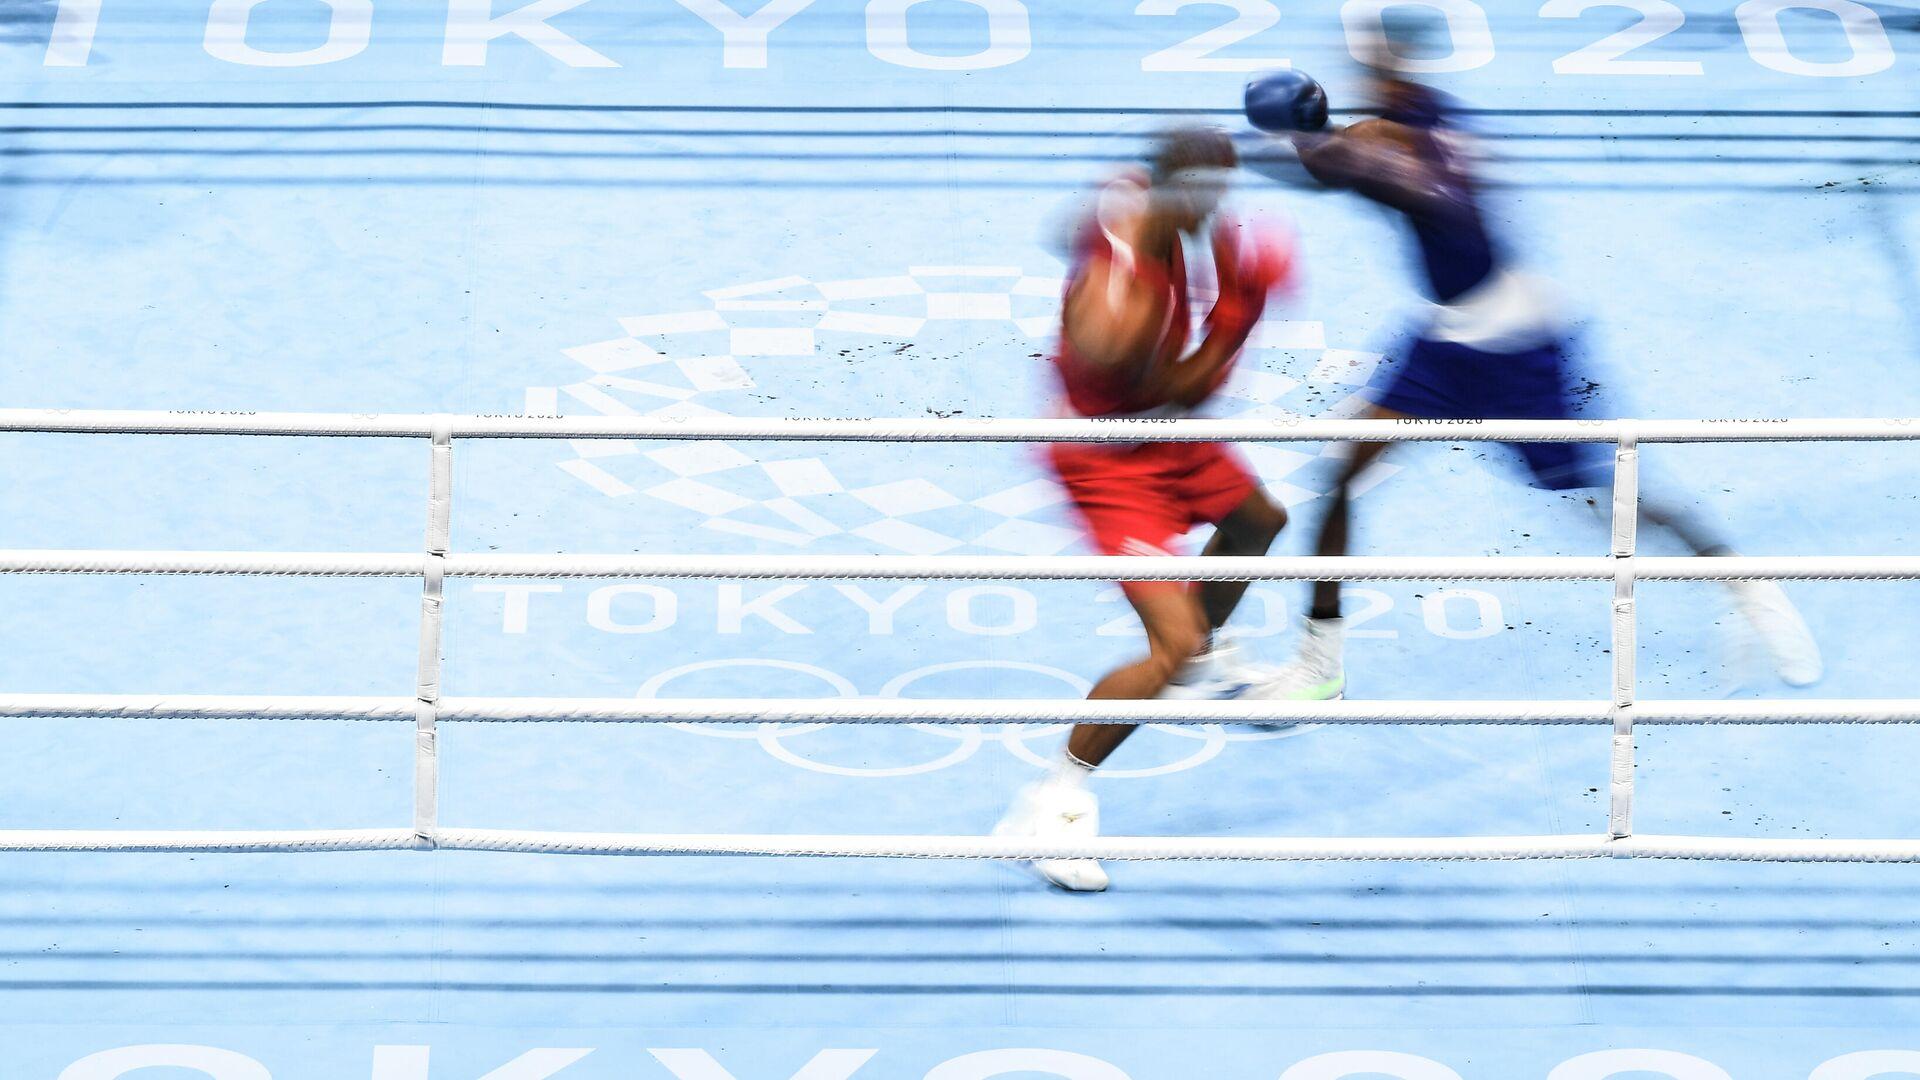 Олимпиада-2020. Бокс. Мужчины до 81 кг - РИА Новости, 1920, 02.10.2021